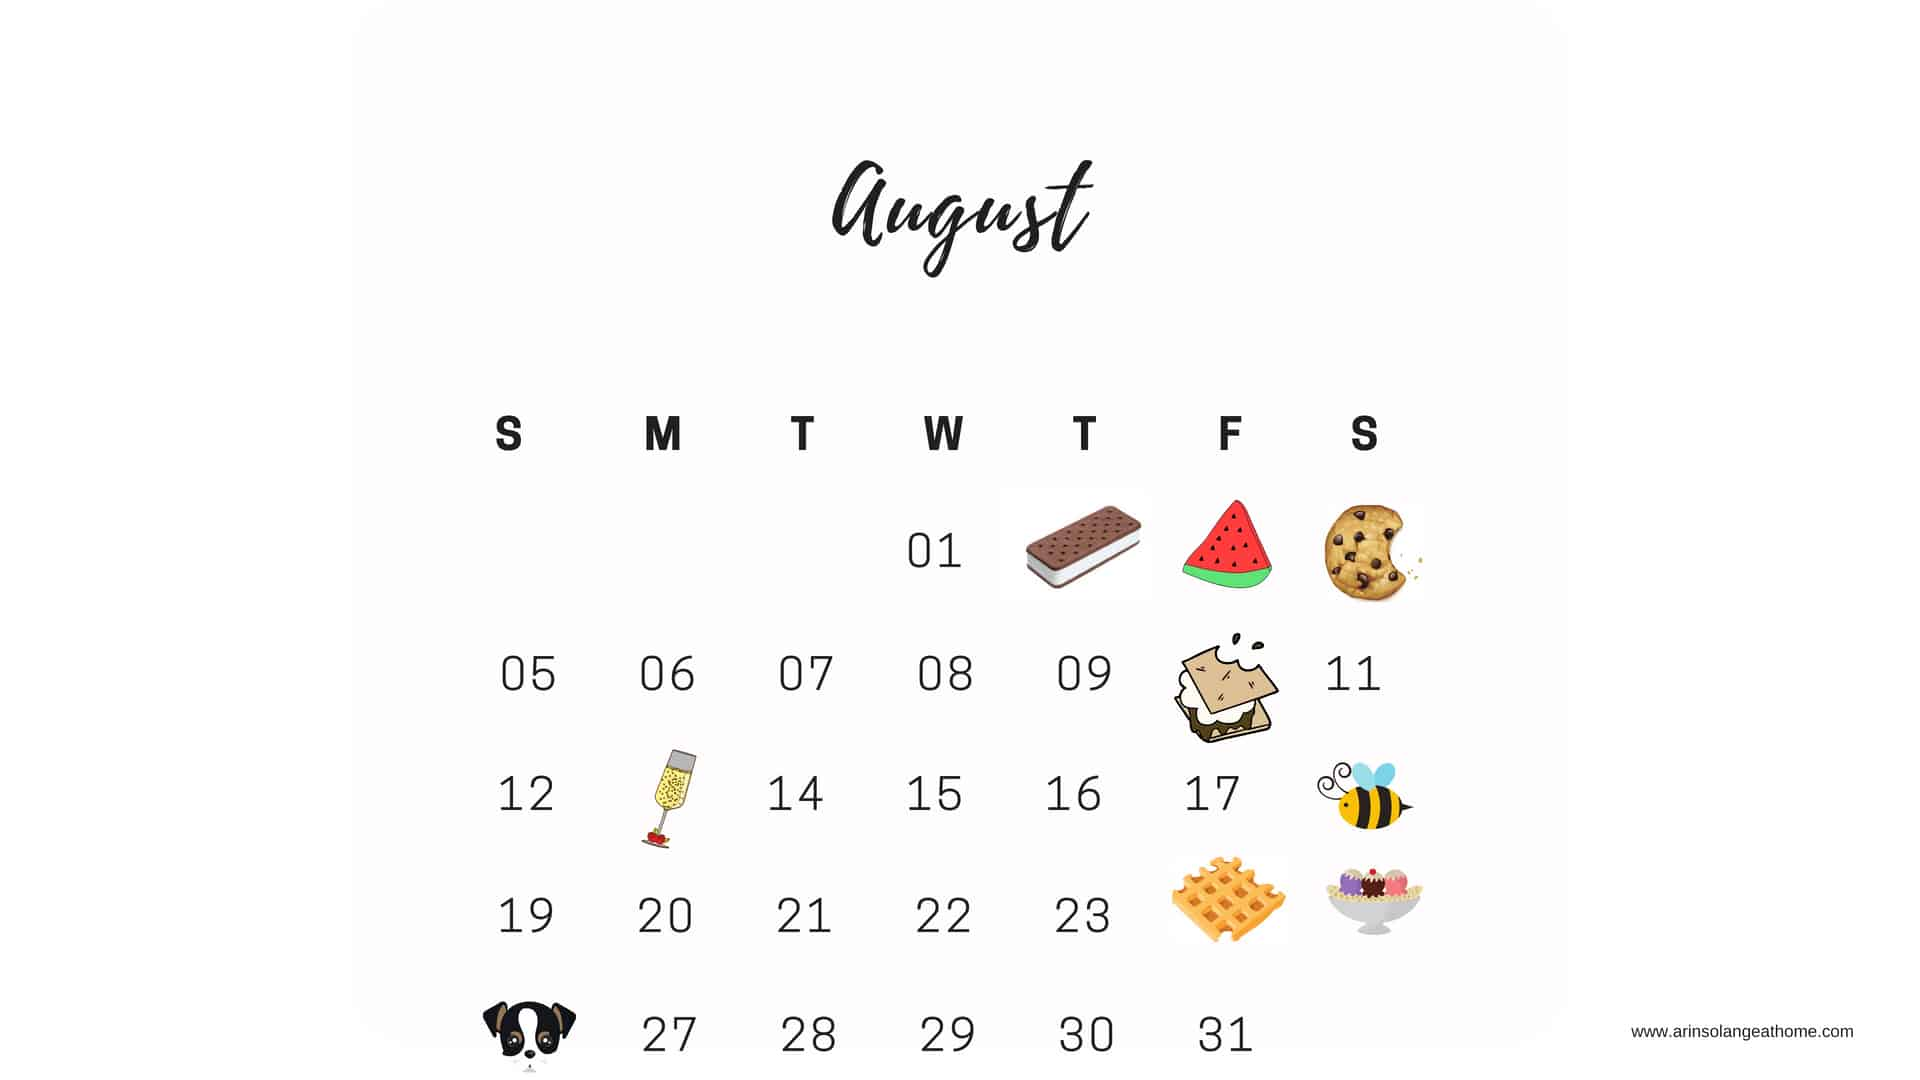 August National Days Calendar